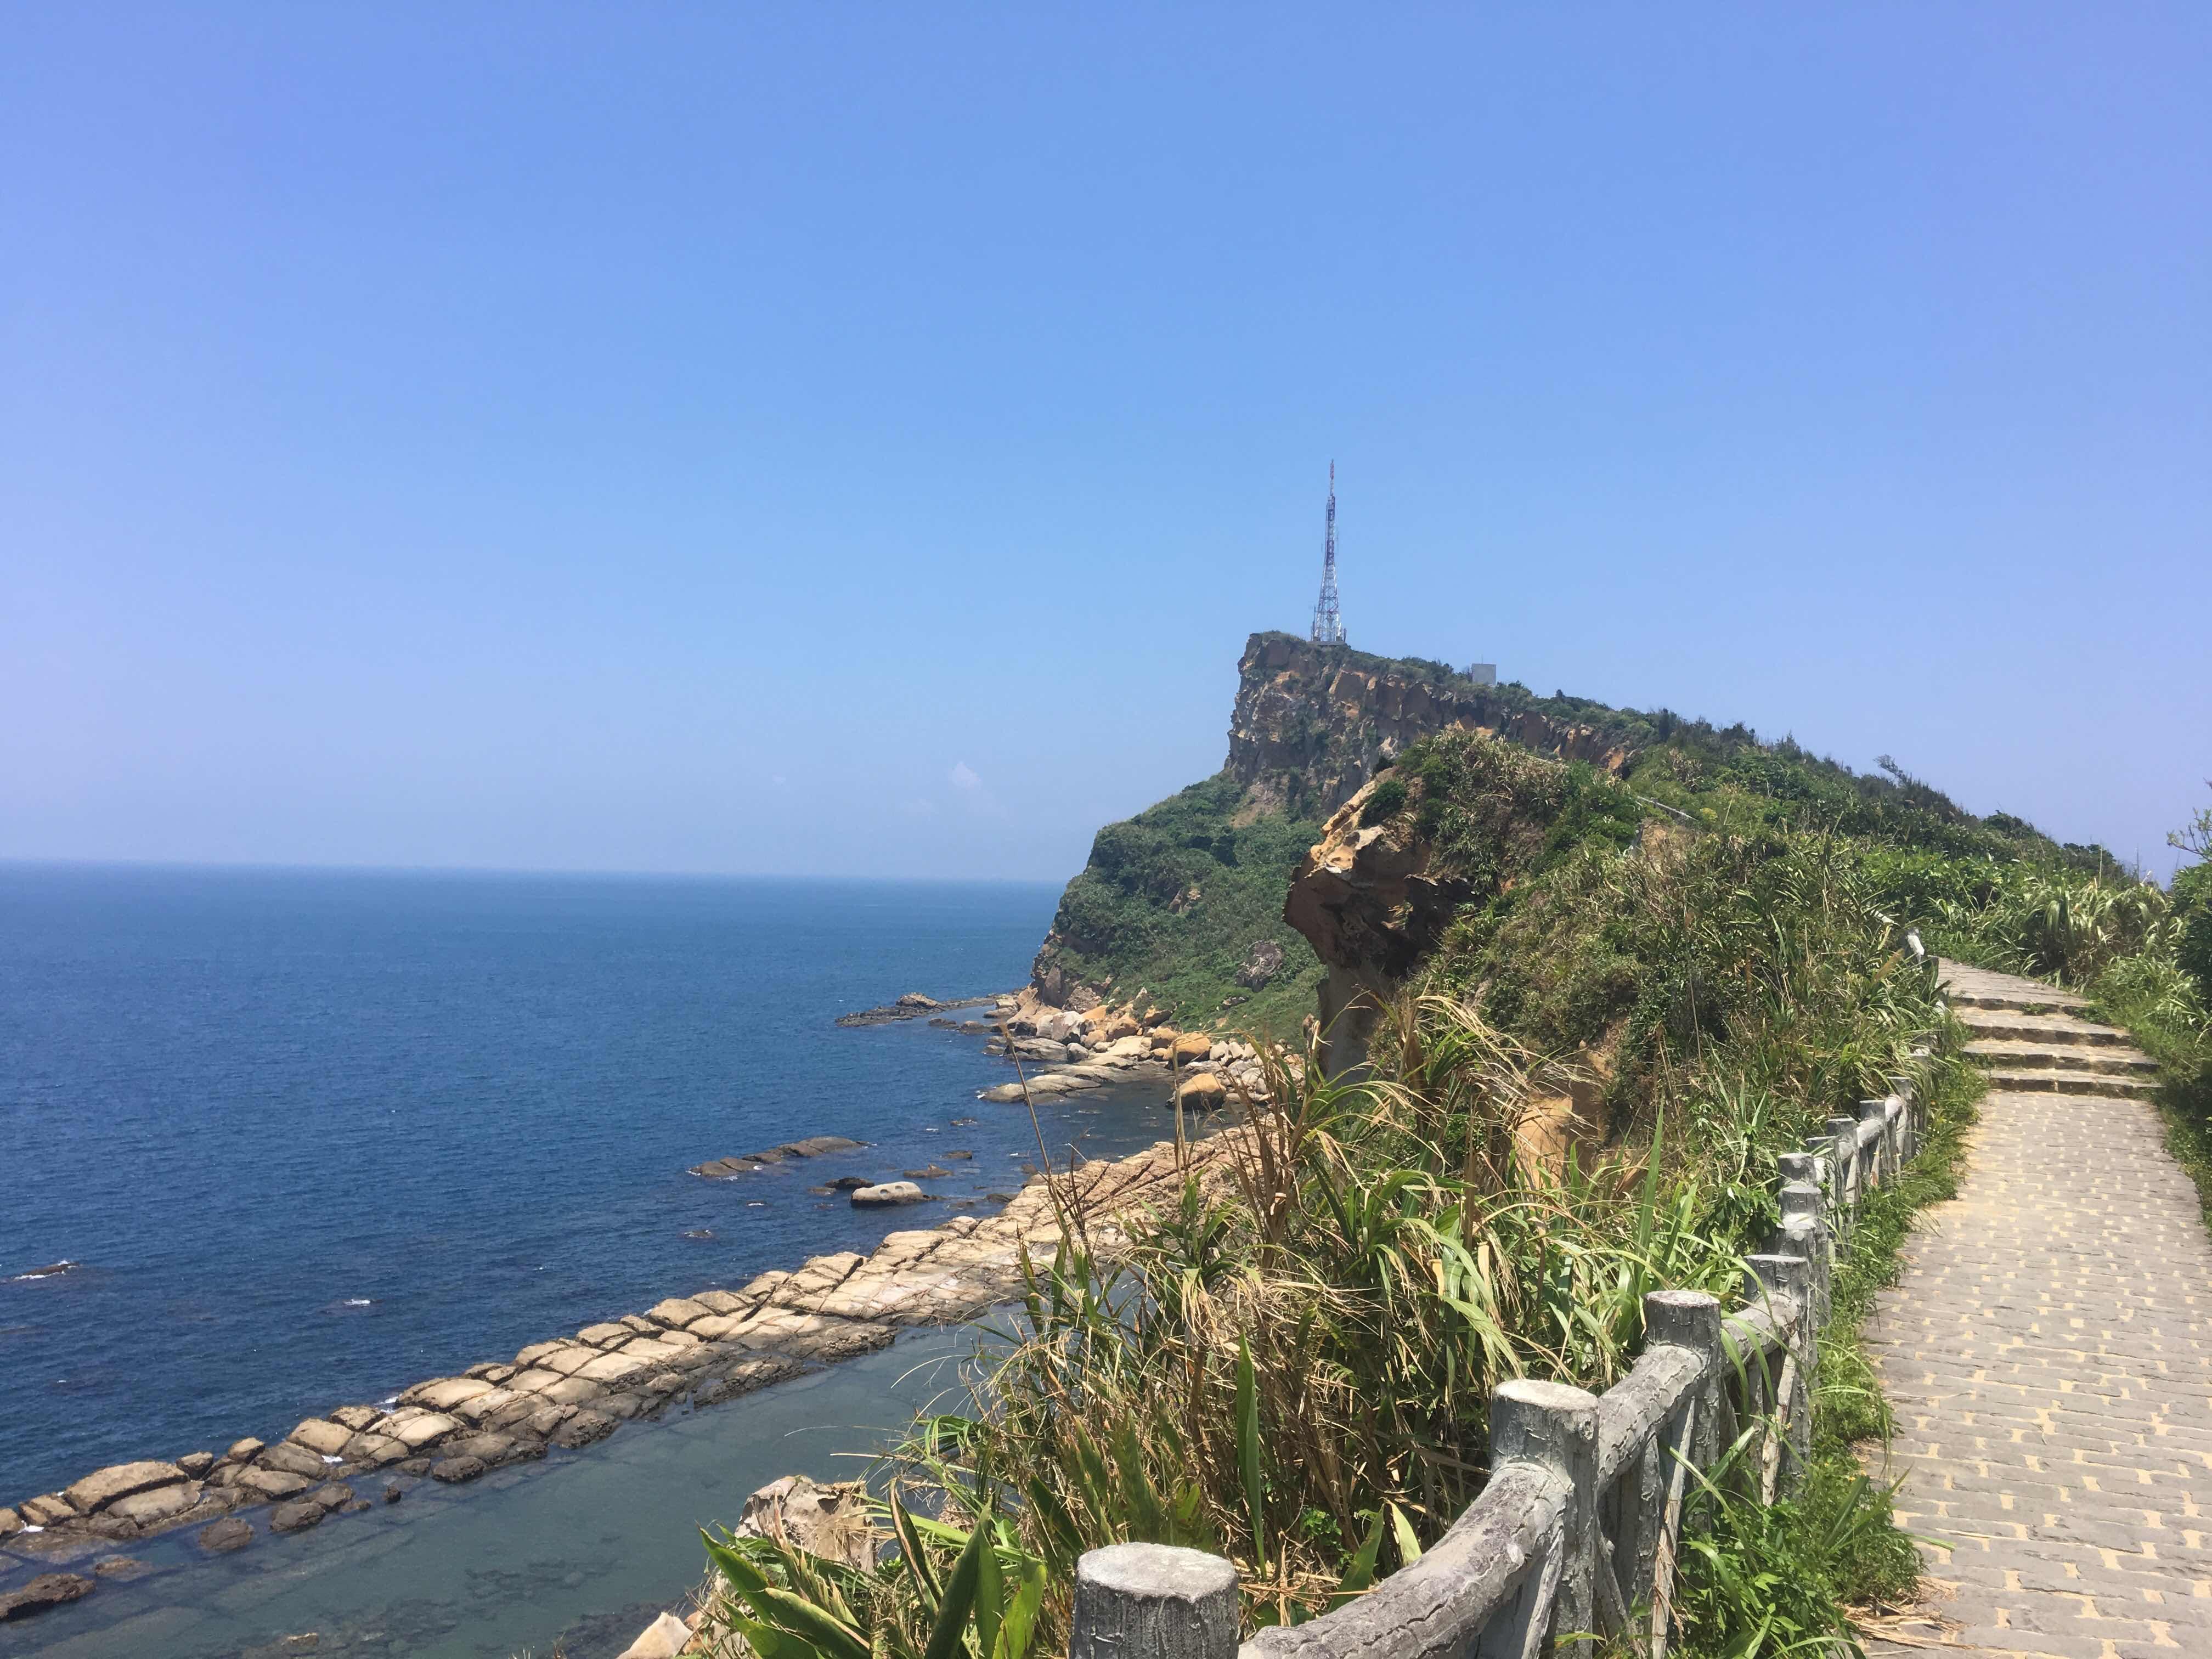 yehliu geopark queen's head yehliu peninsula north coast taipei taiwan